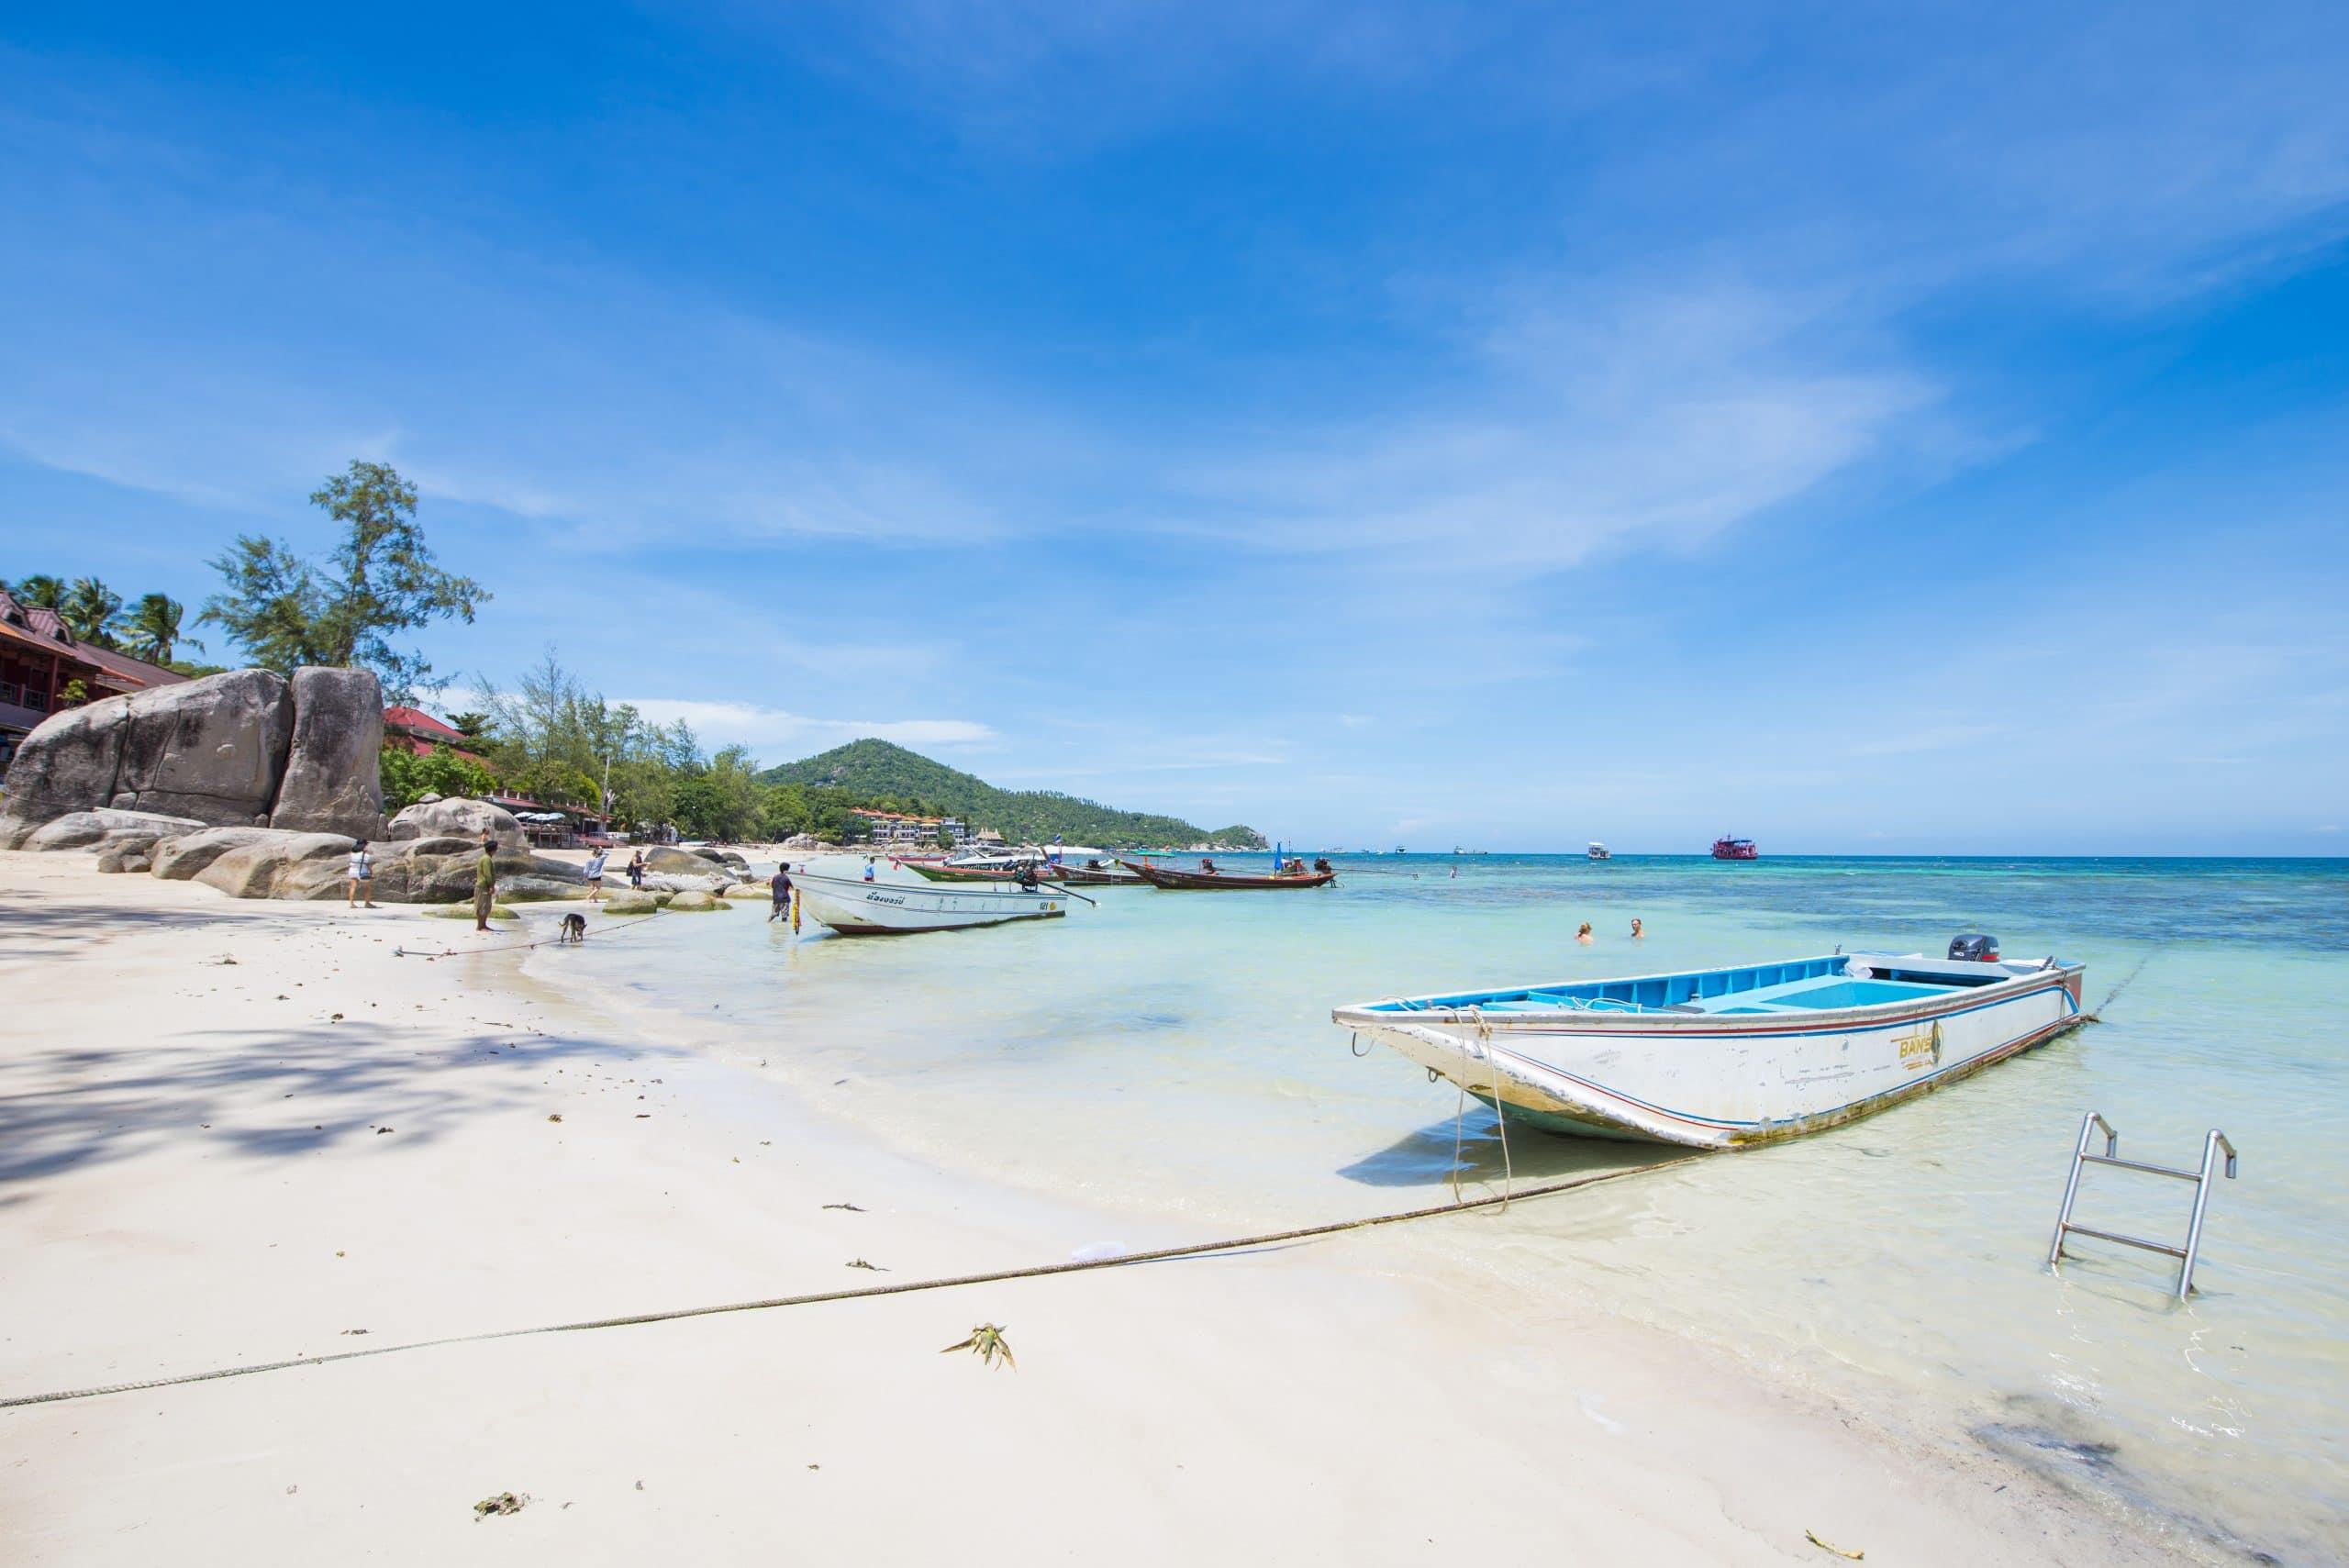 sairee beach koh tao thailand